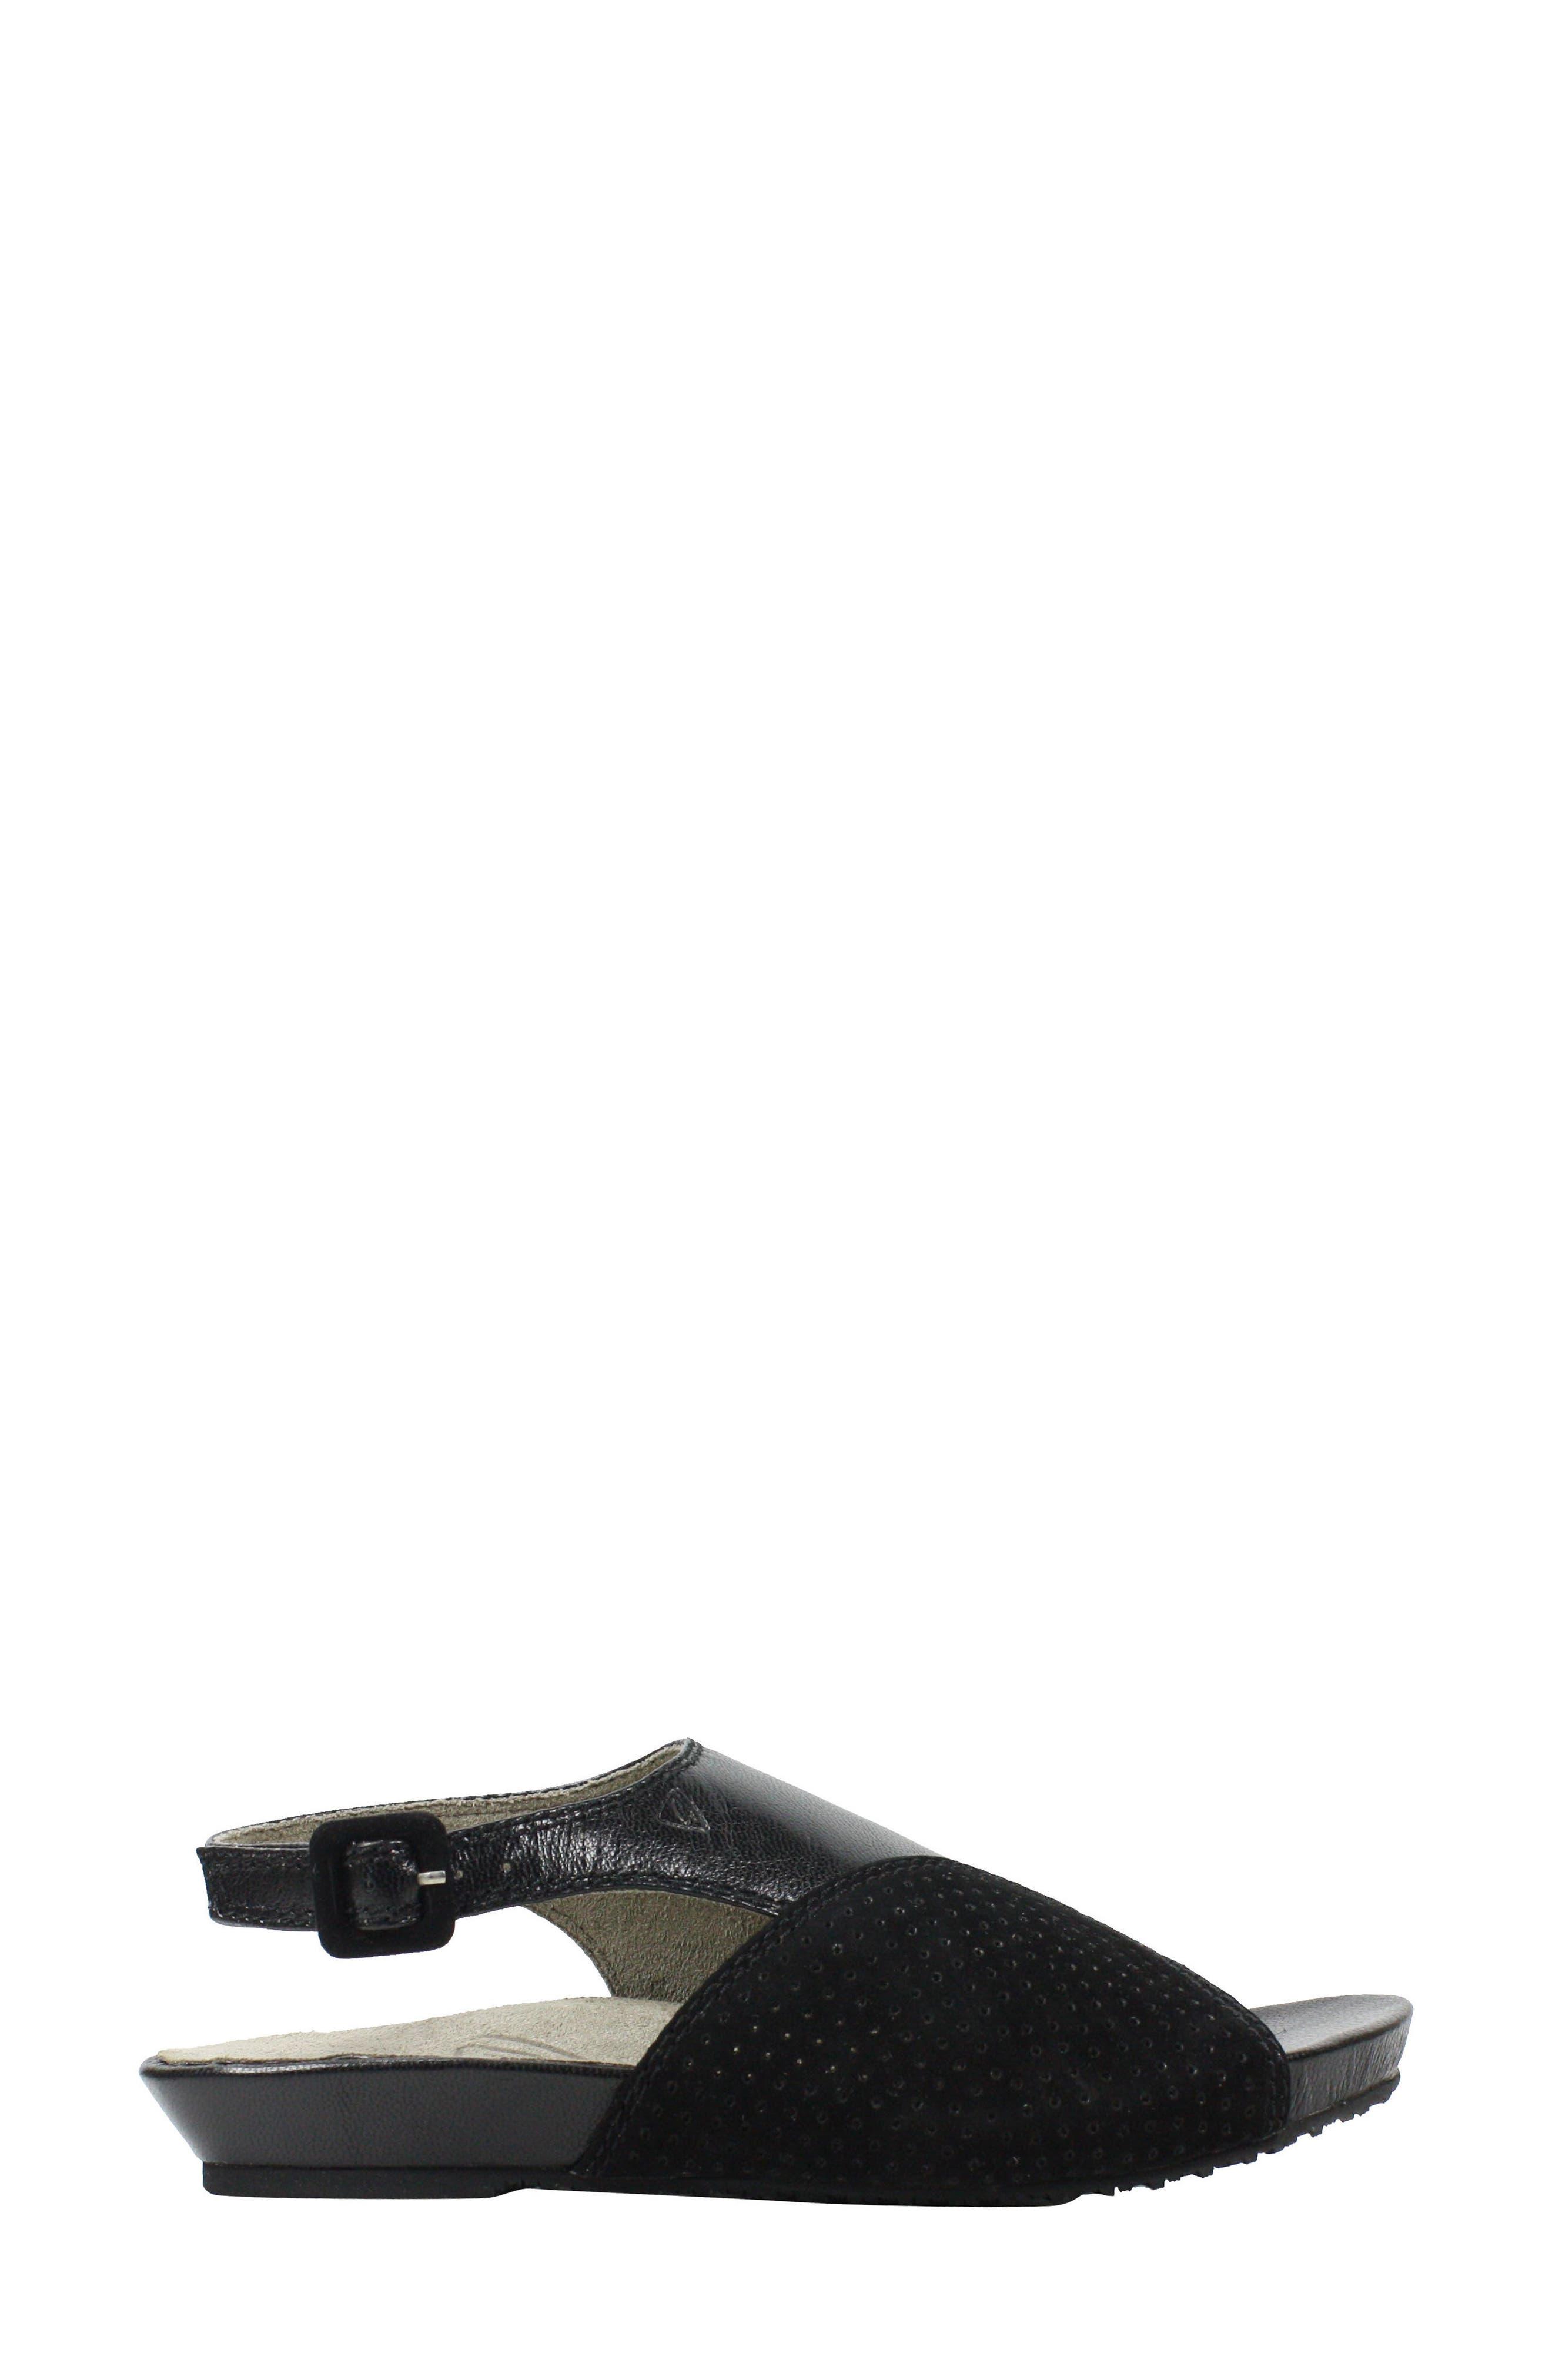 Dalenna Ankle Strap Sandal,                             Alternate thumbnail 3, color,                             Black Leather